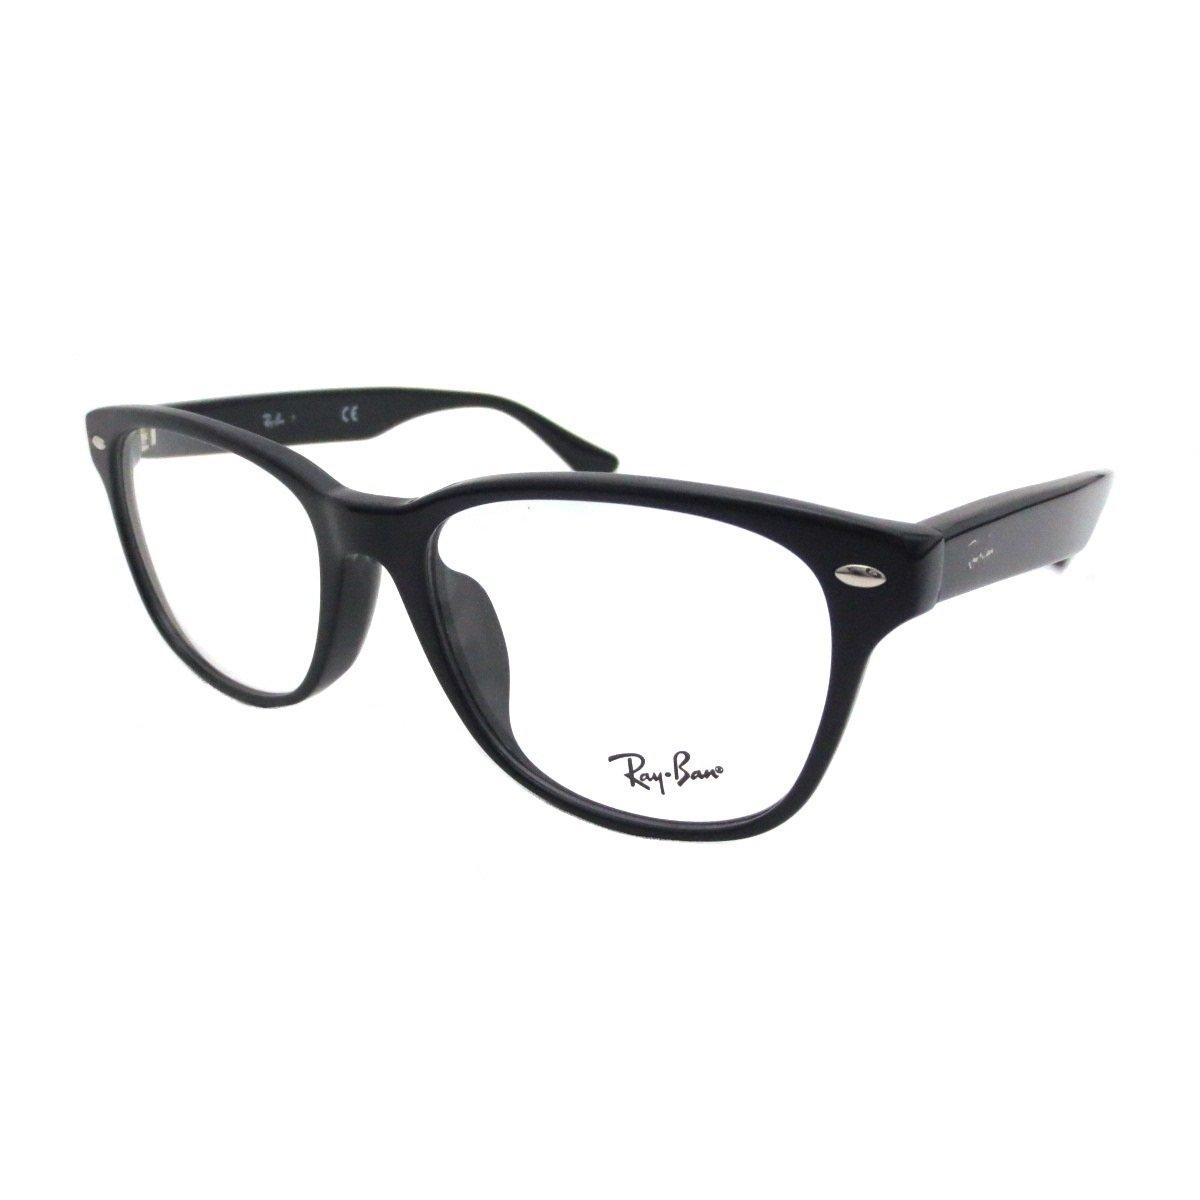 bui レイバン PCメガネ Ray-Ban ダテメガネ RX5359F 2000(55)眼精疲労予防レンズ(ビュイ bui)セット(伊達眼鏡用)   B07BKYB2RF